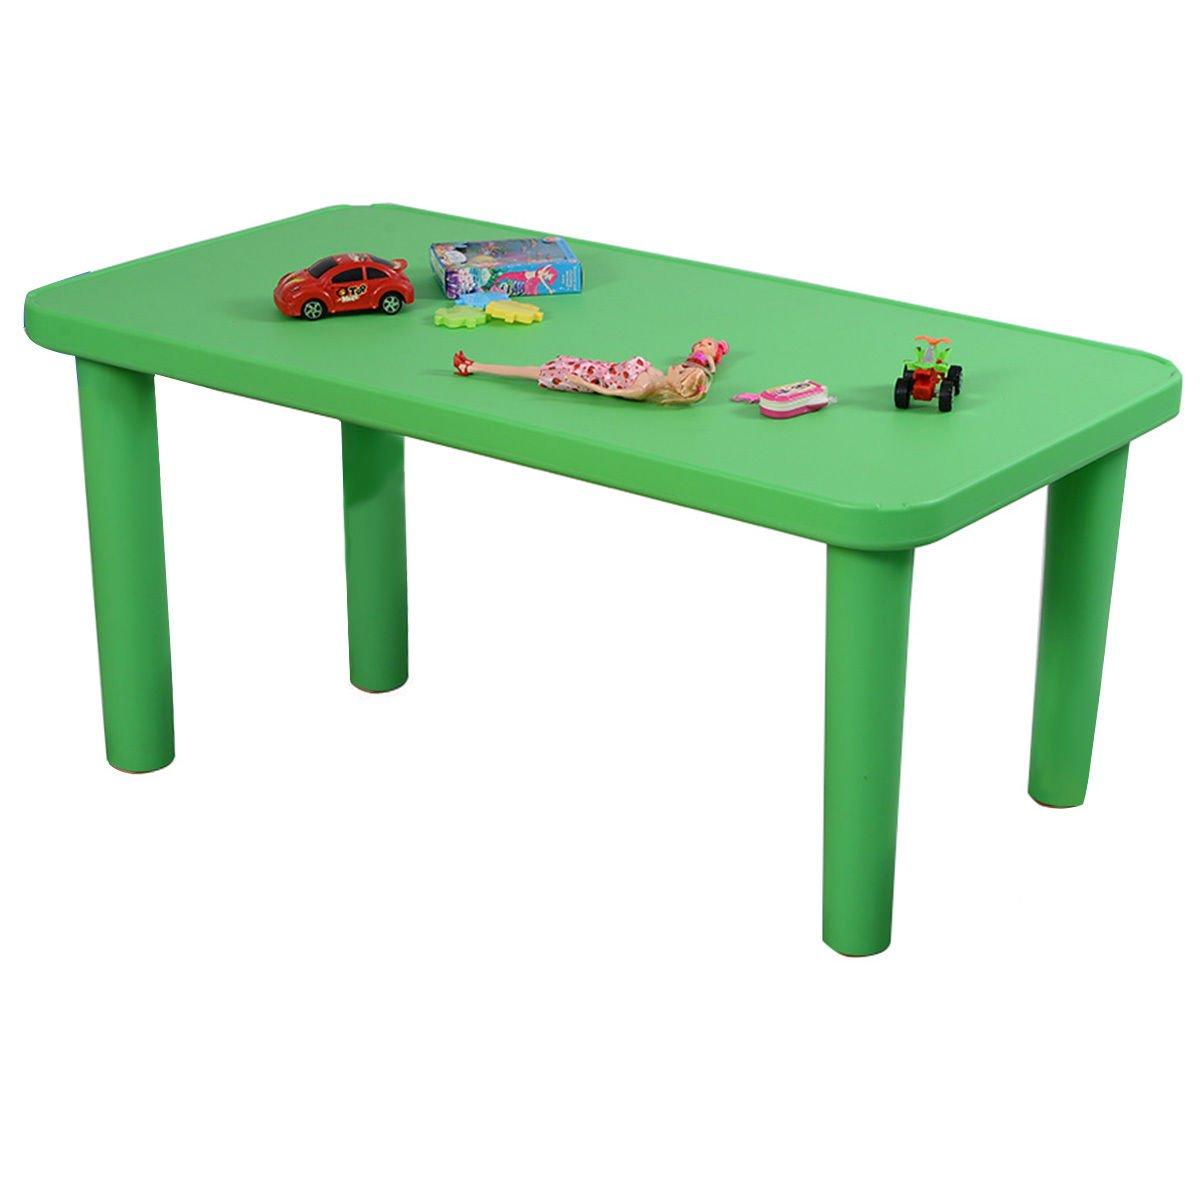 Amazoncom UBRTools Kids Portable Plastic Table Learn and Play